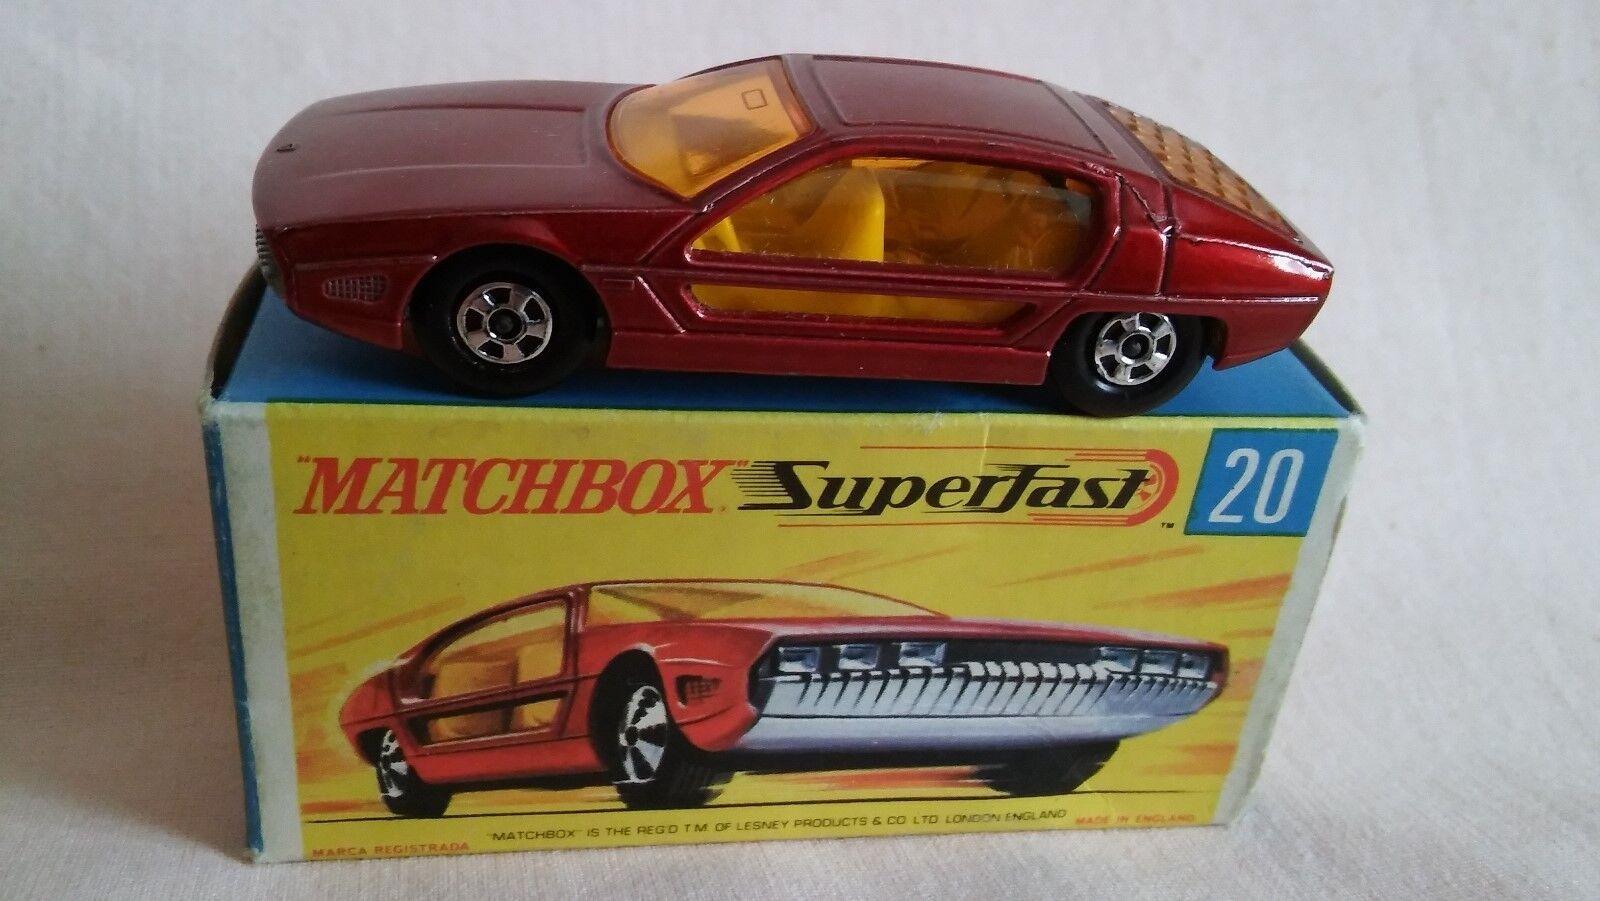 MATCHBOX SUPERFAST No20 BOXED LAMBORGHINI MARZAL WITH NARROW WHEELS IN NMIB.